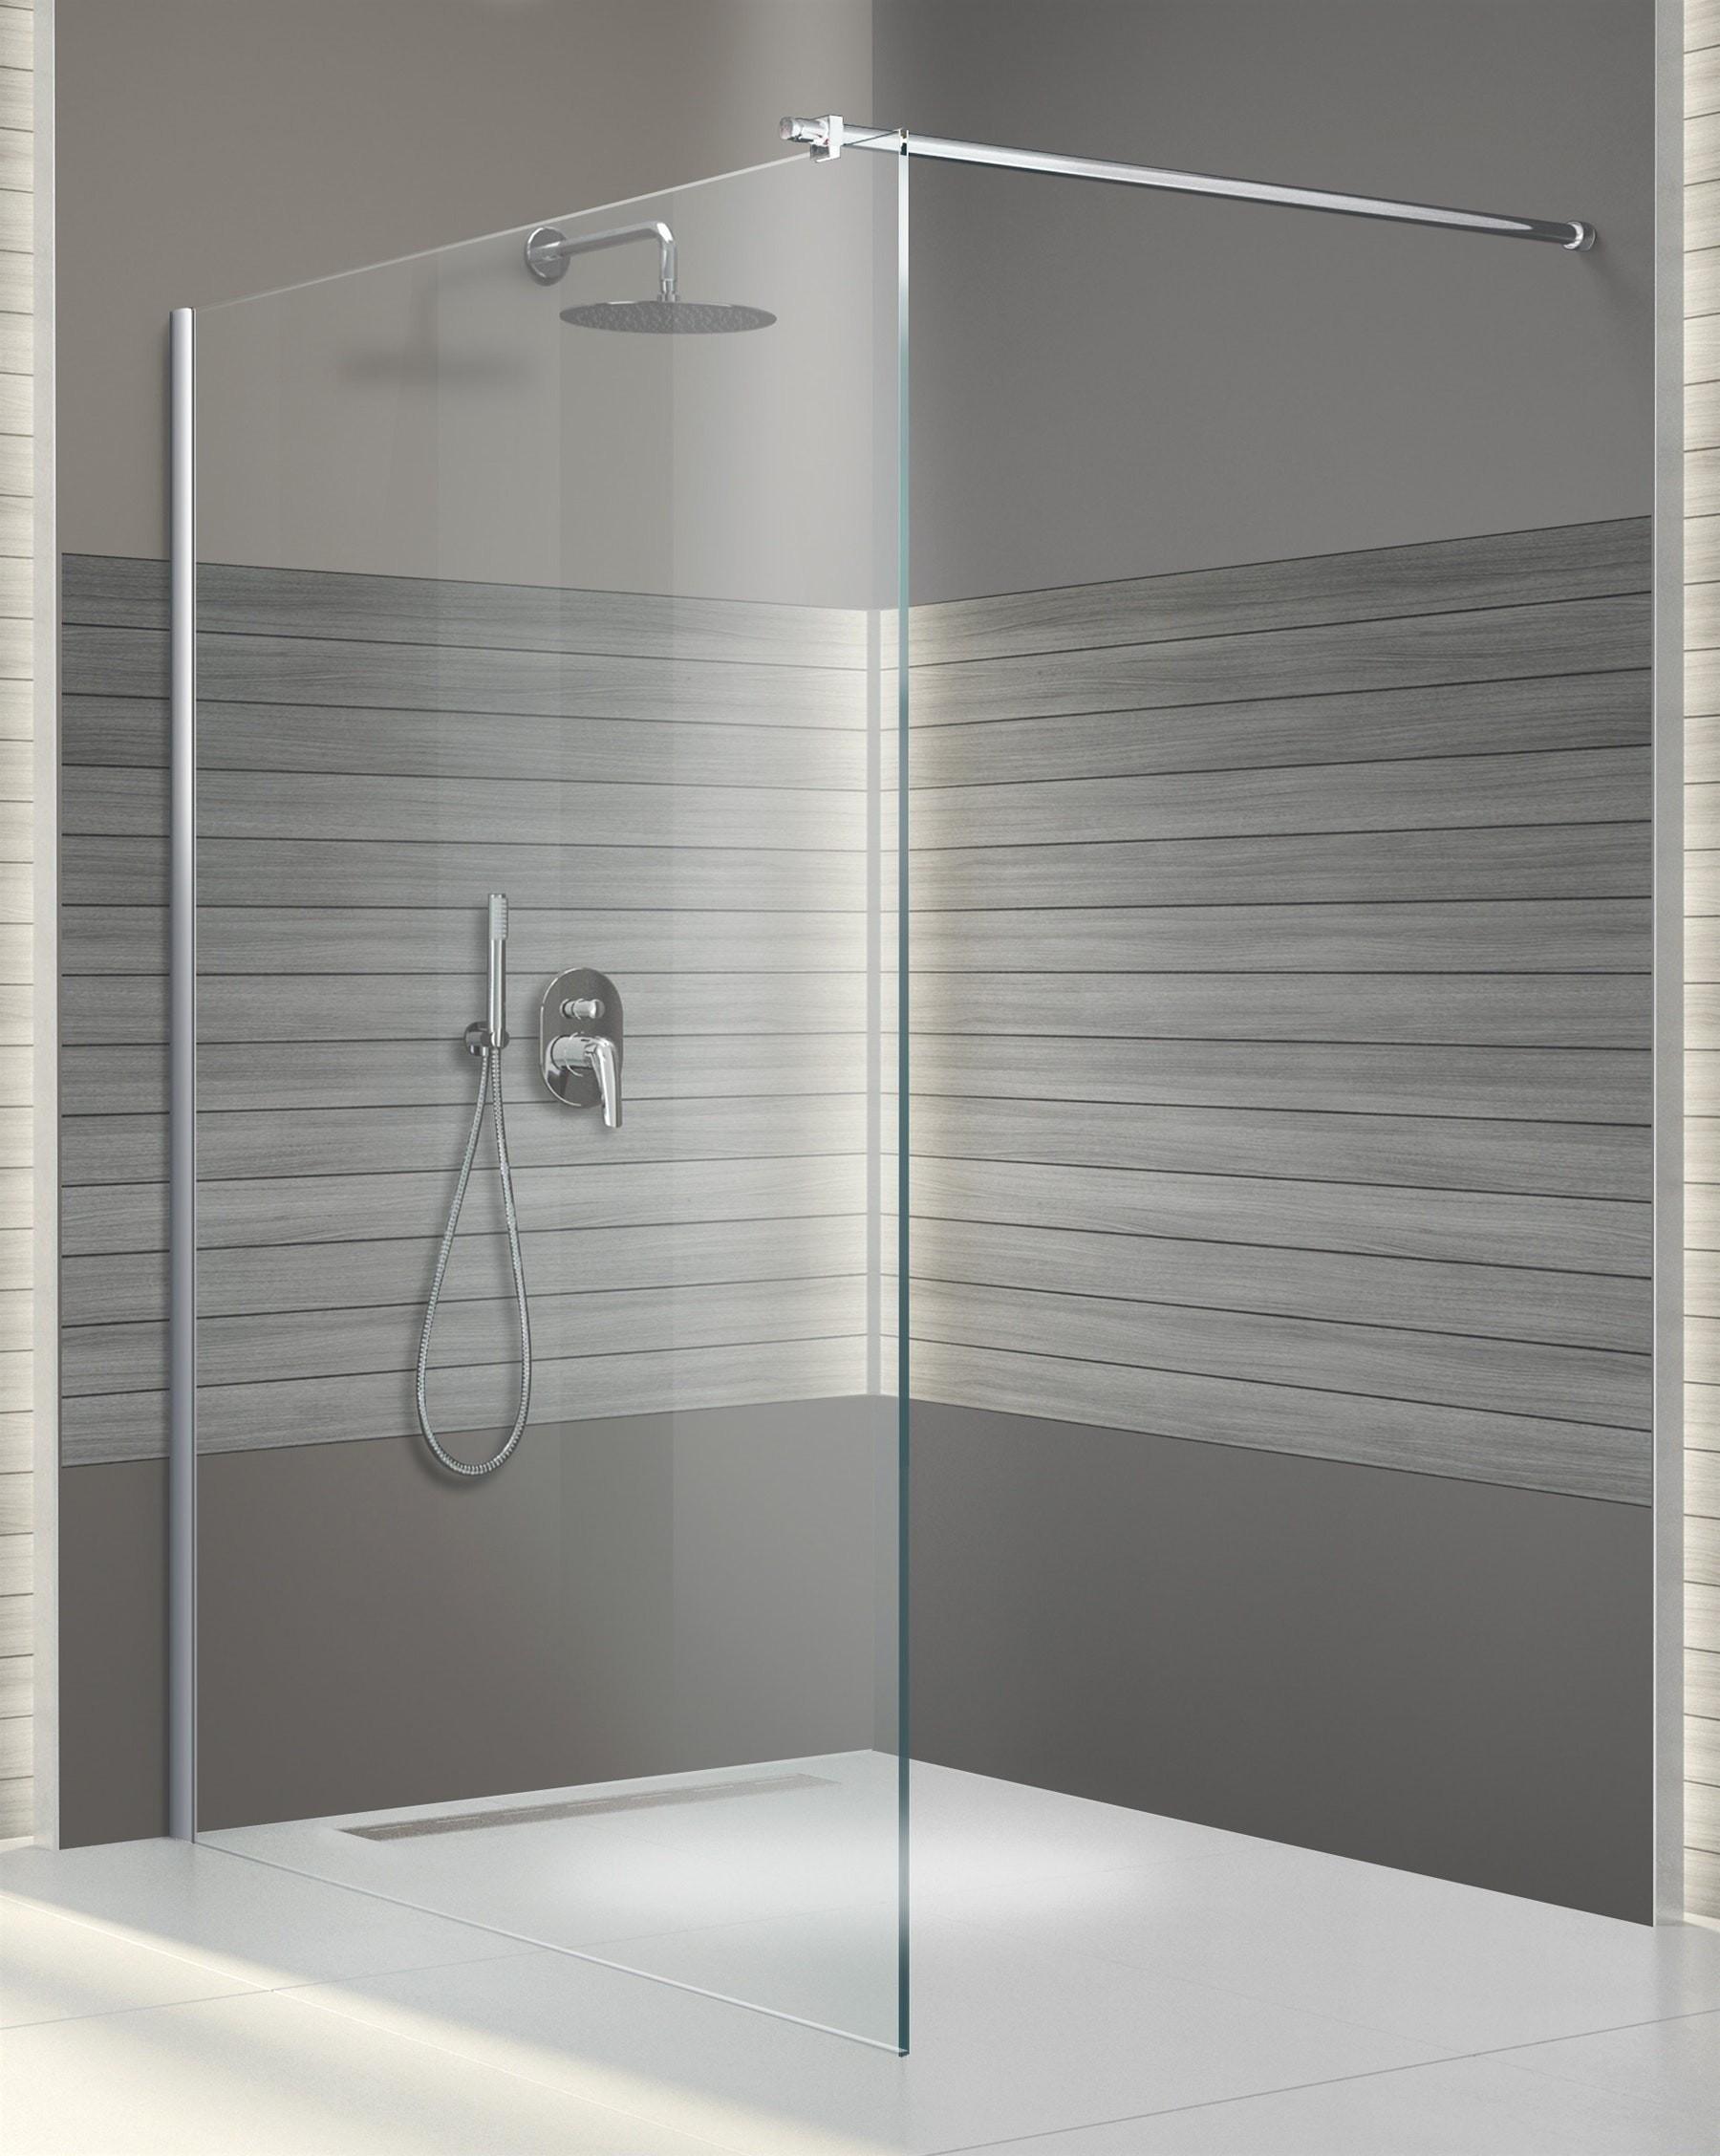 cendrier exterieur castorama altoservices. Black Bedroom Furniture Sets. Home Design Ideas